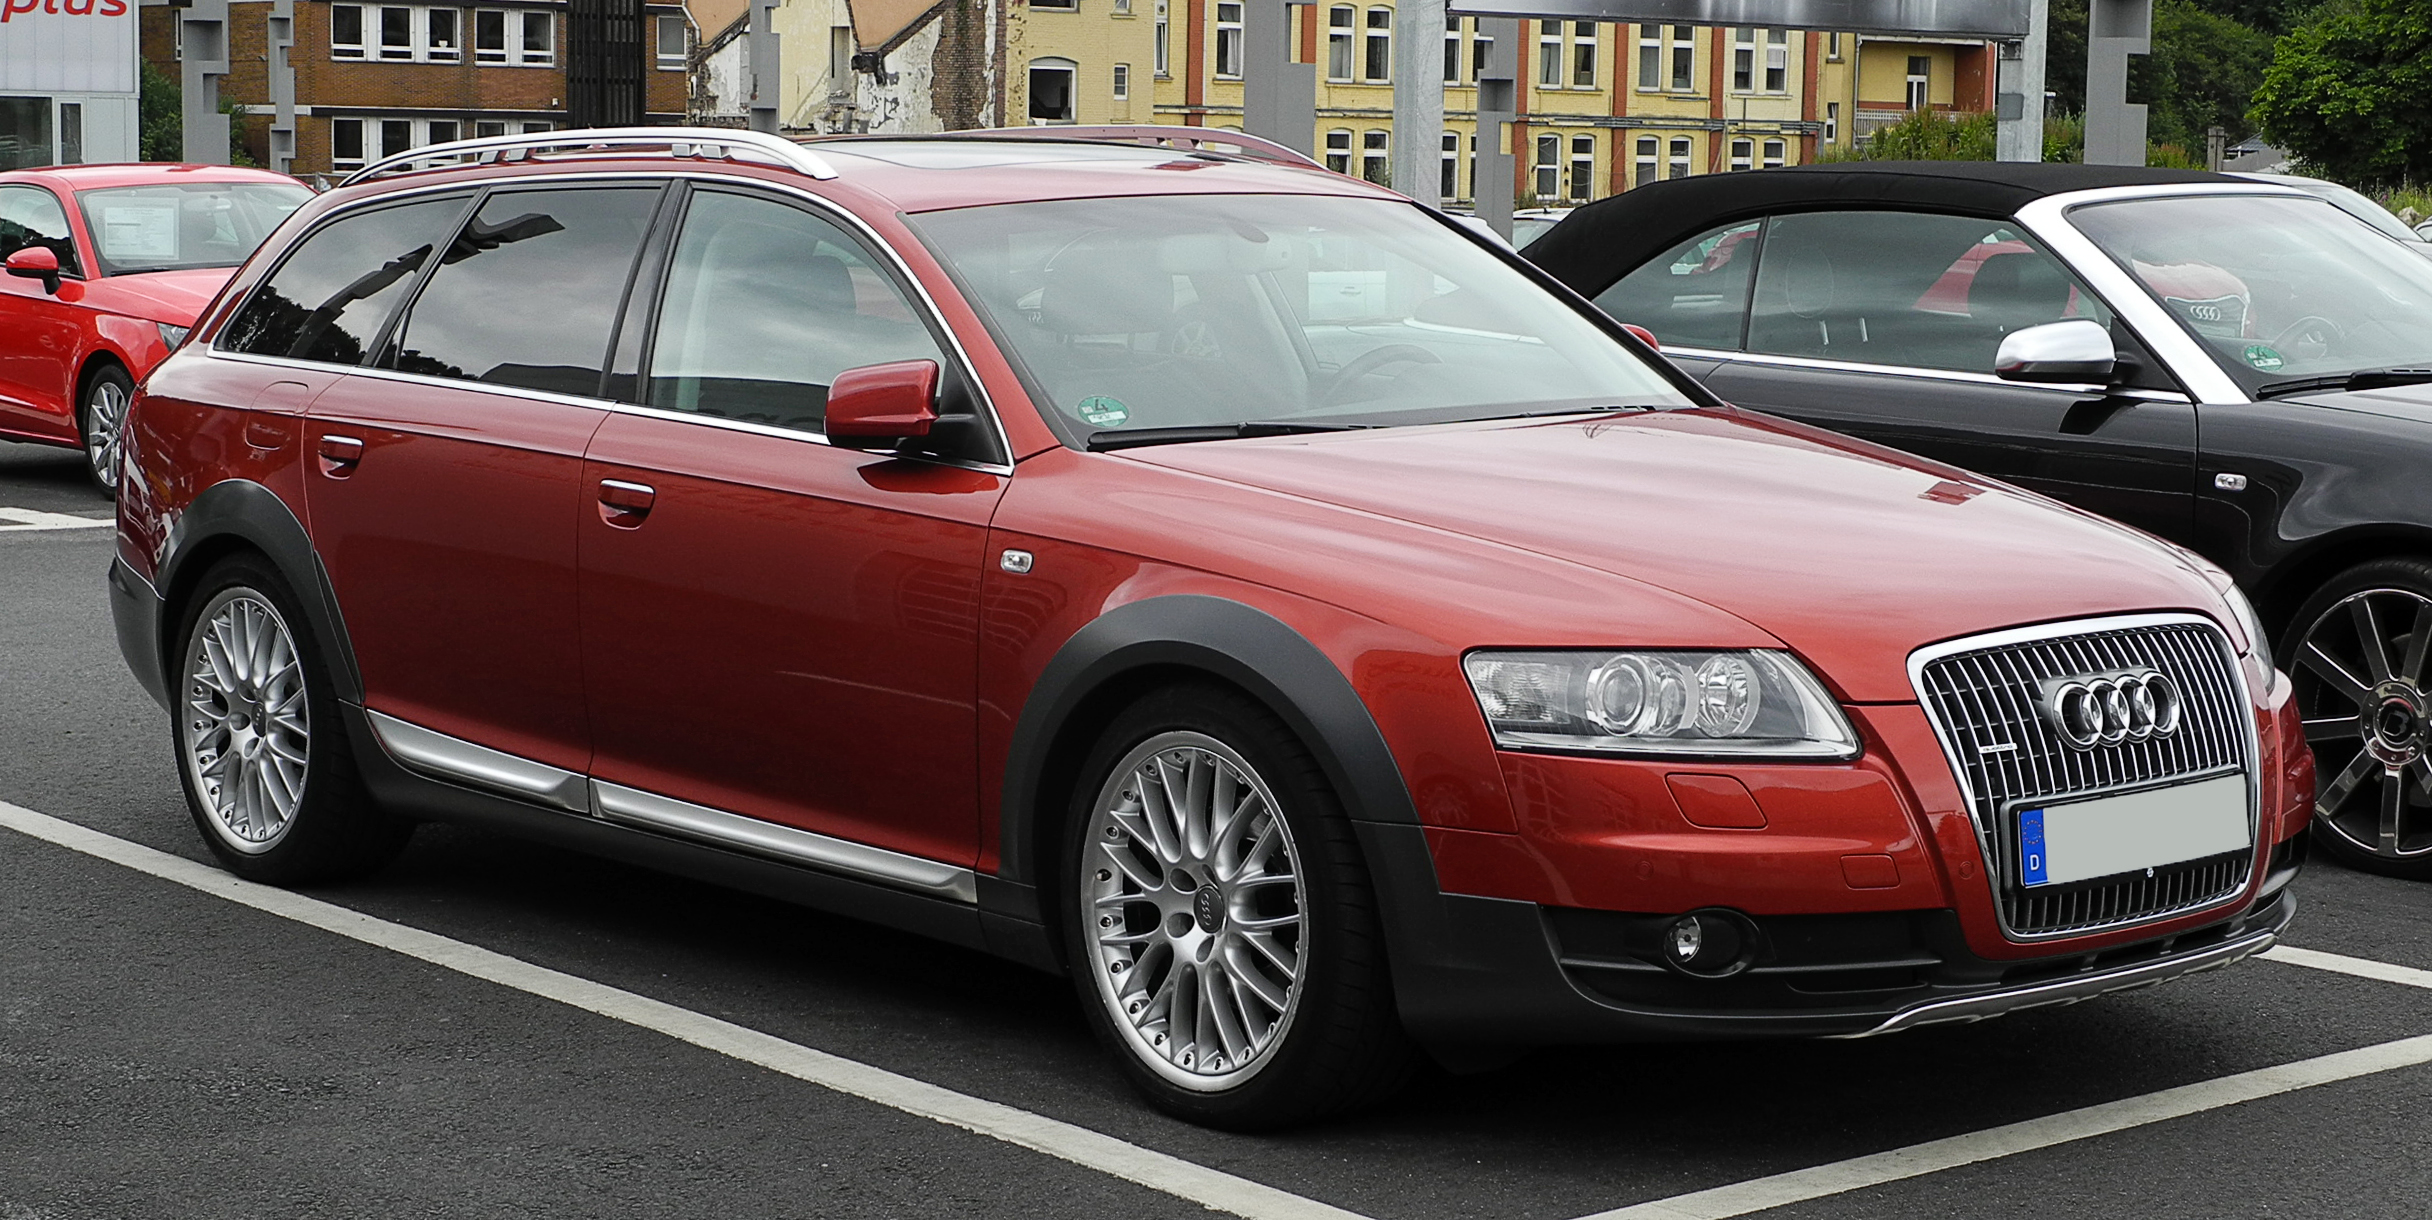 Audi_A6_allroad_quattro_3.0_TDI_(C6)_%E2%80%93_Frontansicht_(1),_13._Juni_2011,_Wuppertal.jpg